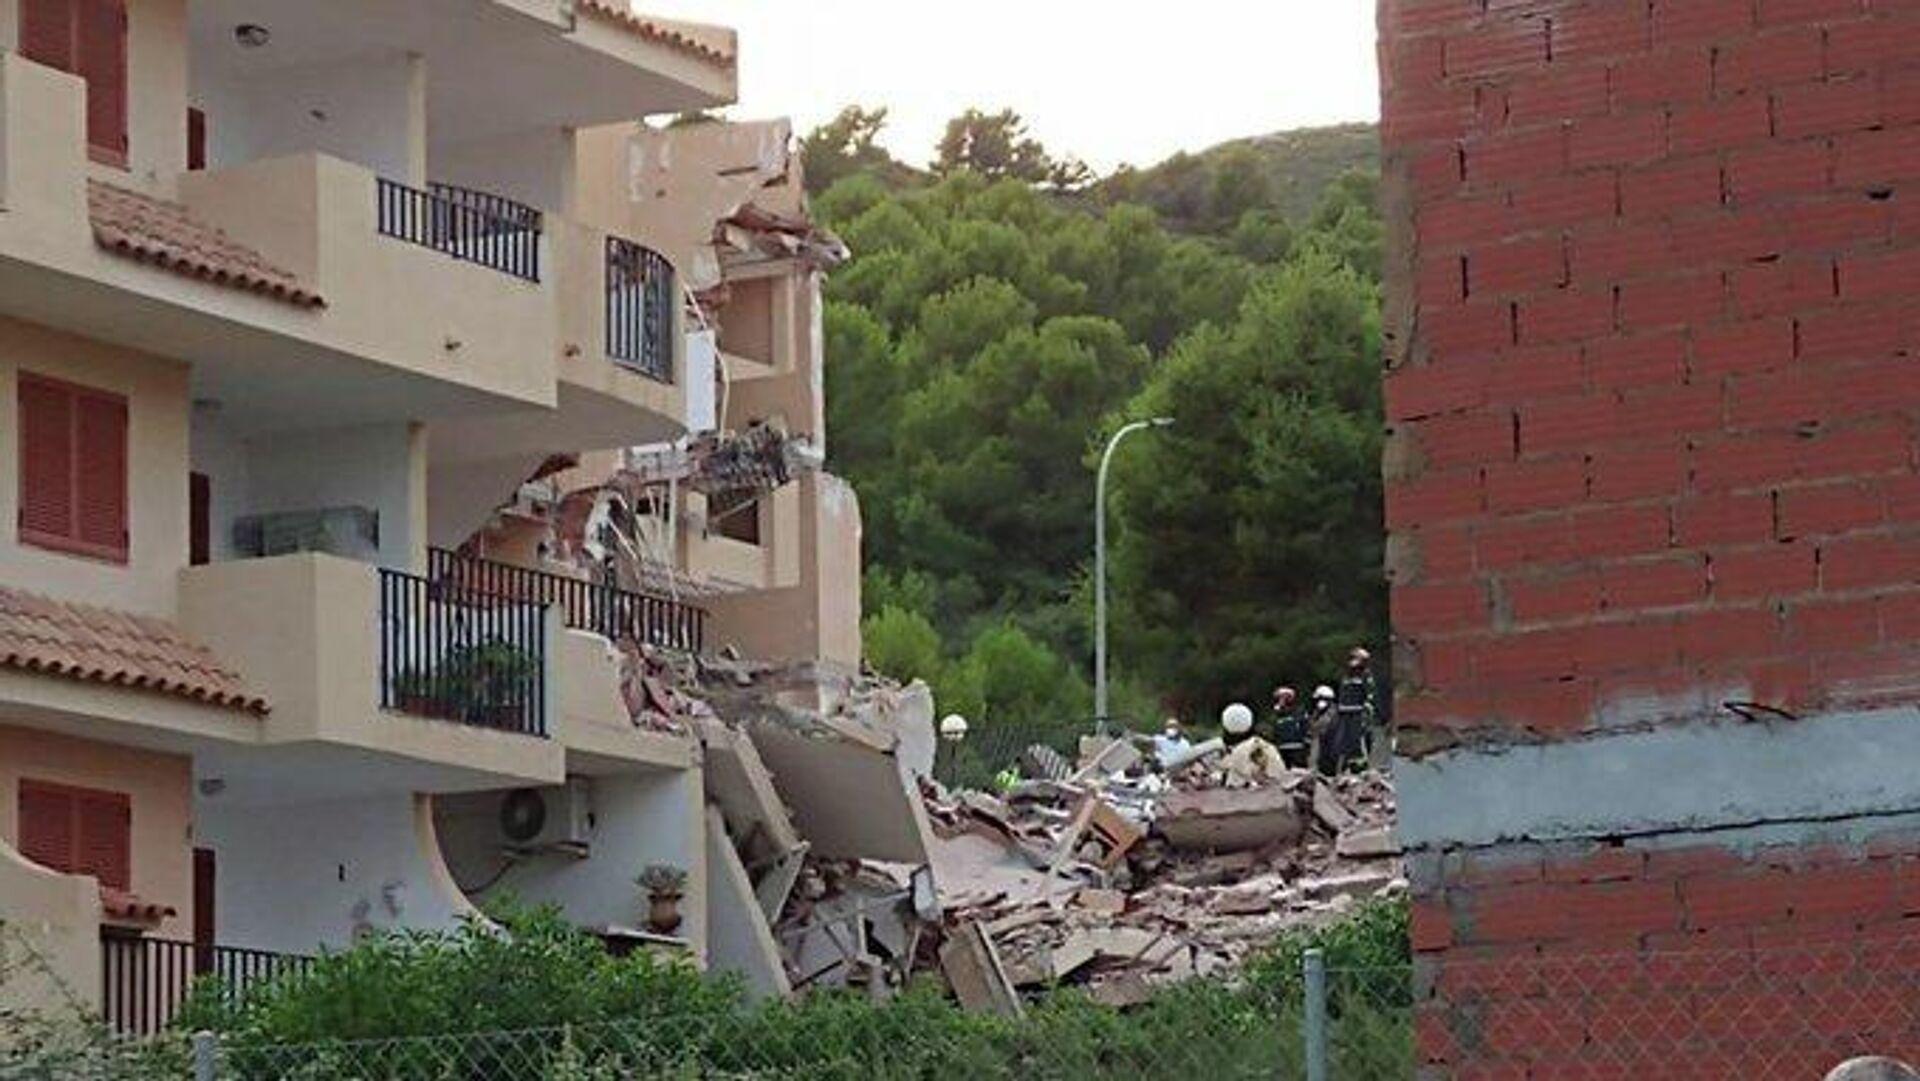 Se derrumba un edificio en Peñíscola, Castellón - Sputnik Mundo, 1920, 25.08.2021